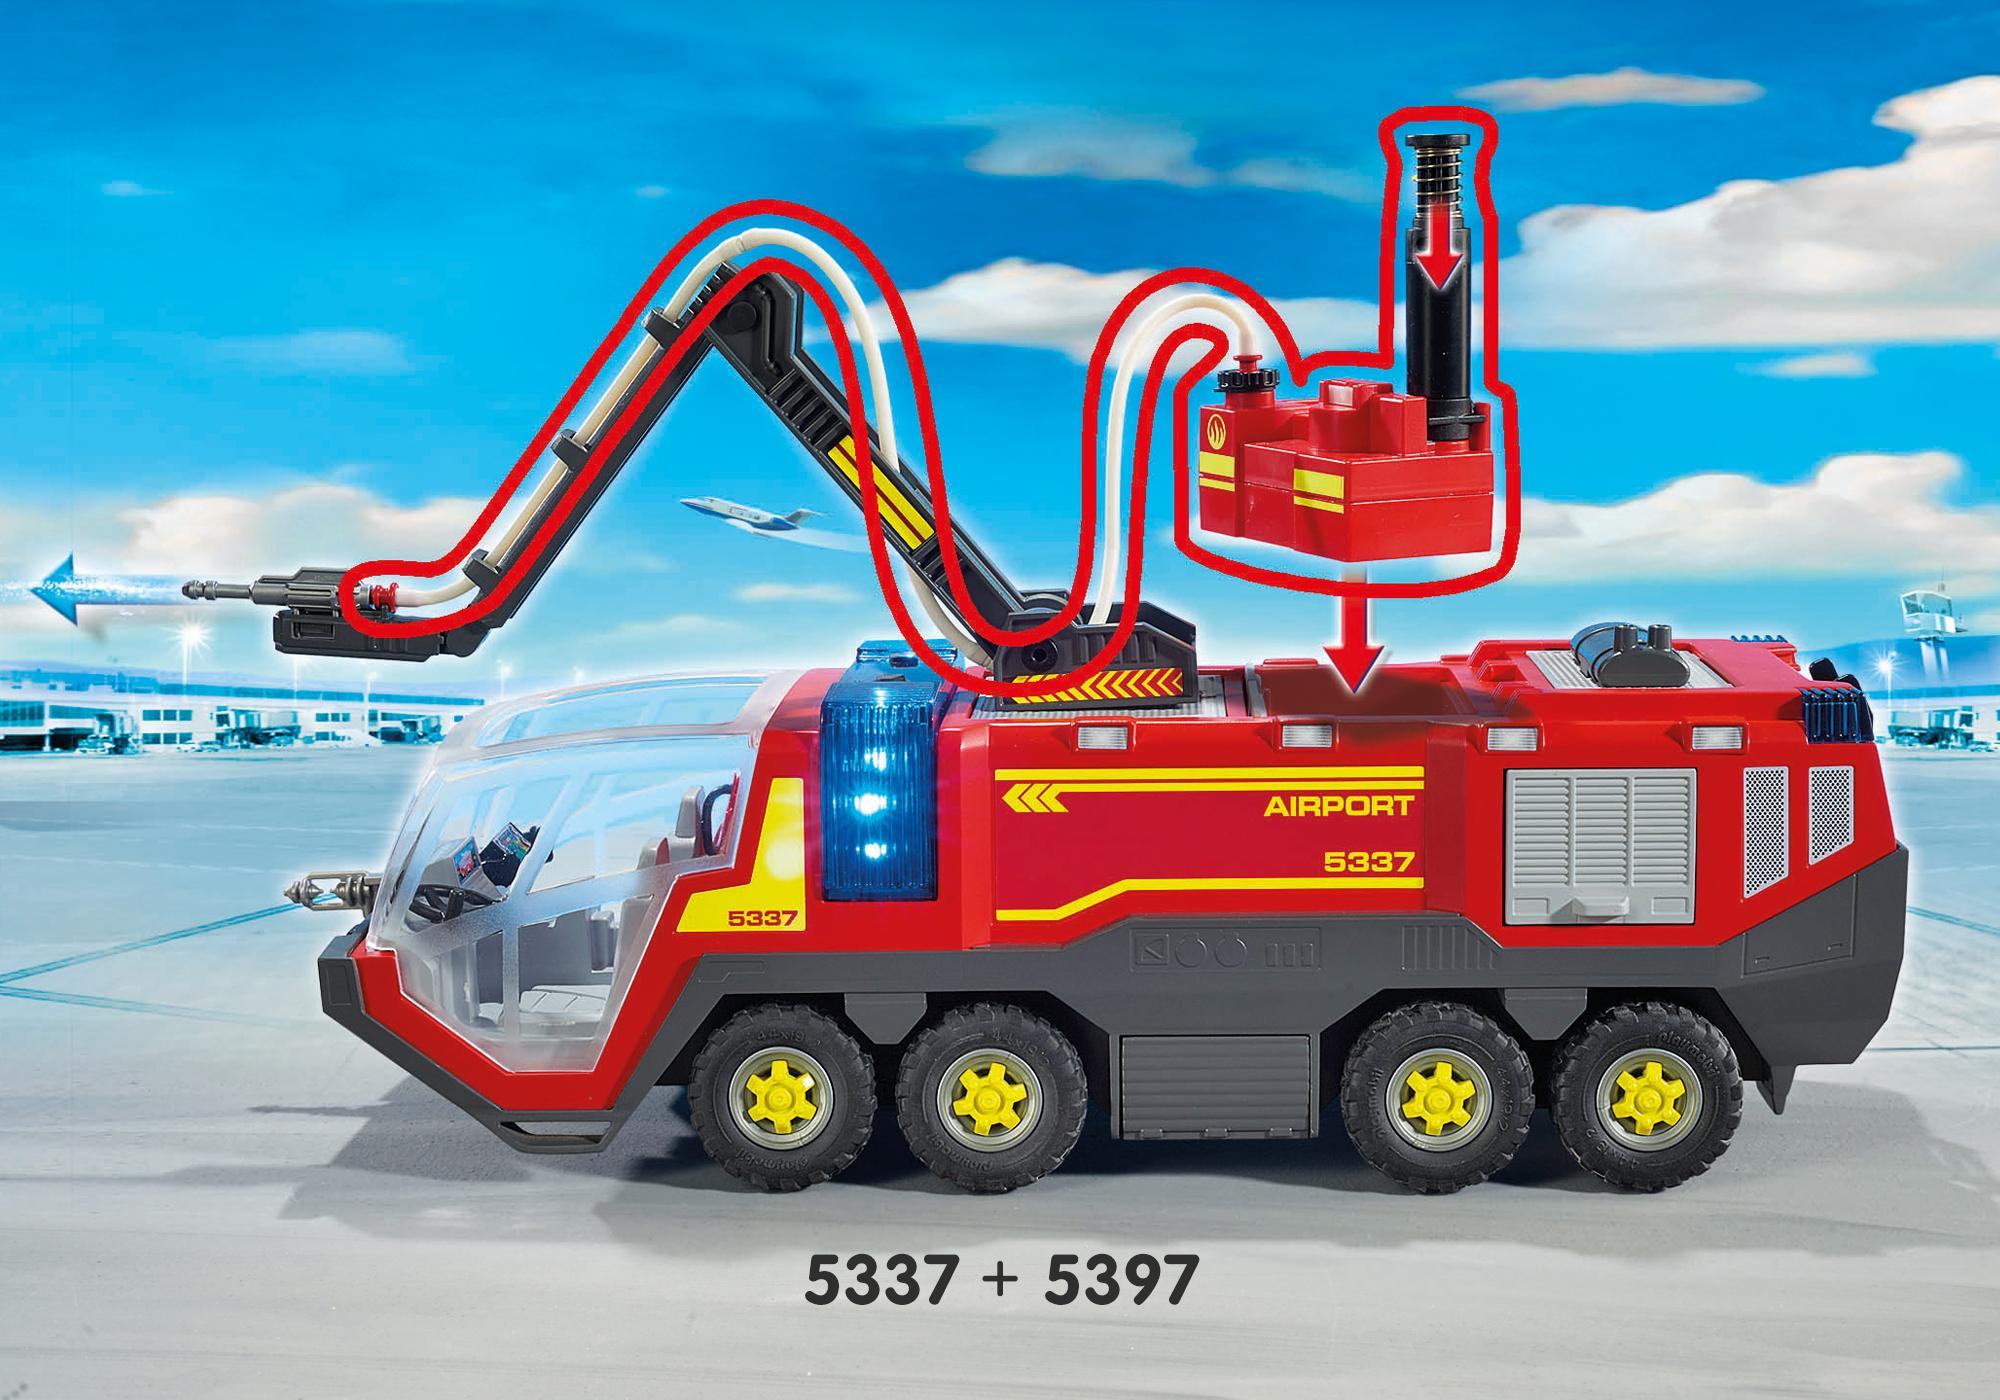 http://media.playmobil.com/i/playmobil/5337_product_extra5/Luchthavenbrandweer met licht en geluid